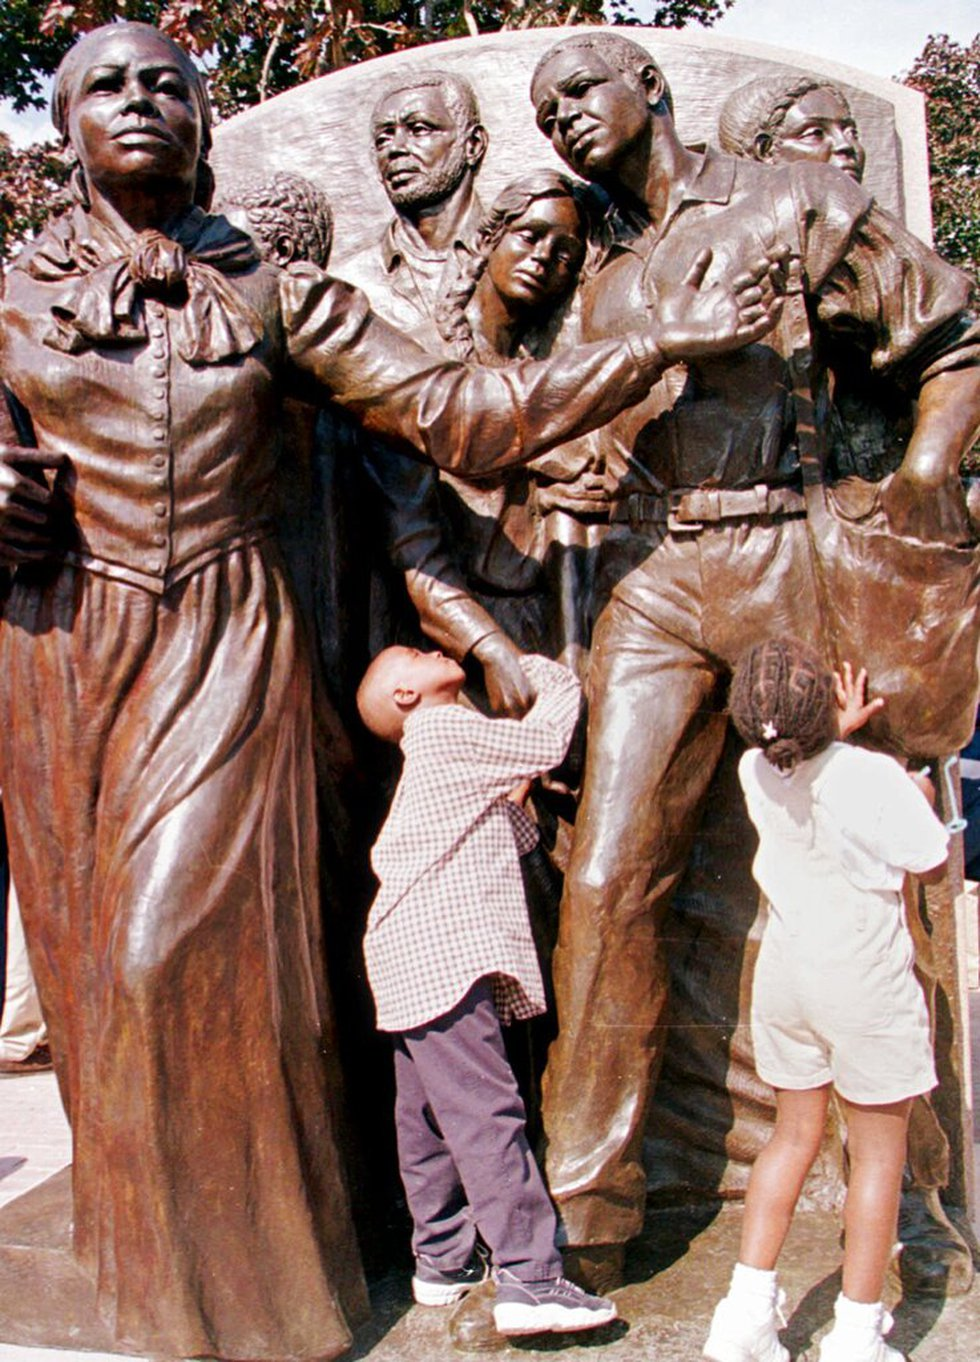 Byusa Kironyo, 7, and his sister, Bwiza Kironyo, 5, both of Brockton, Mass., explore a statue...